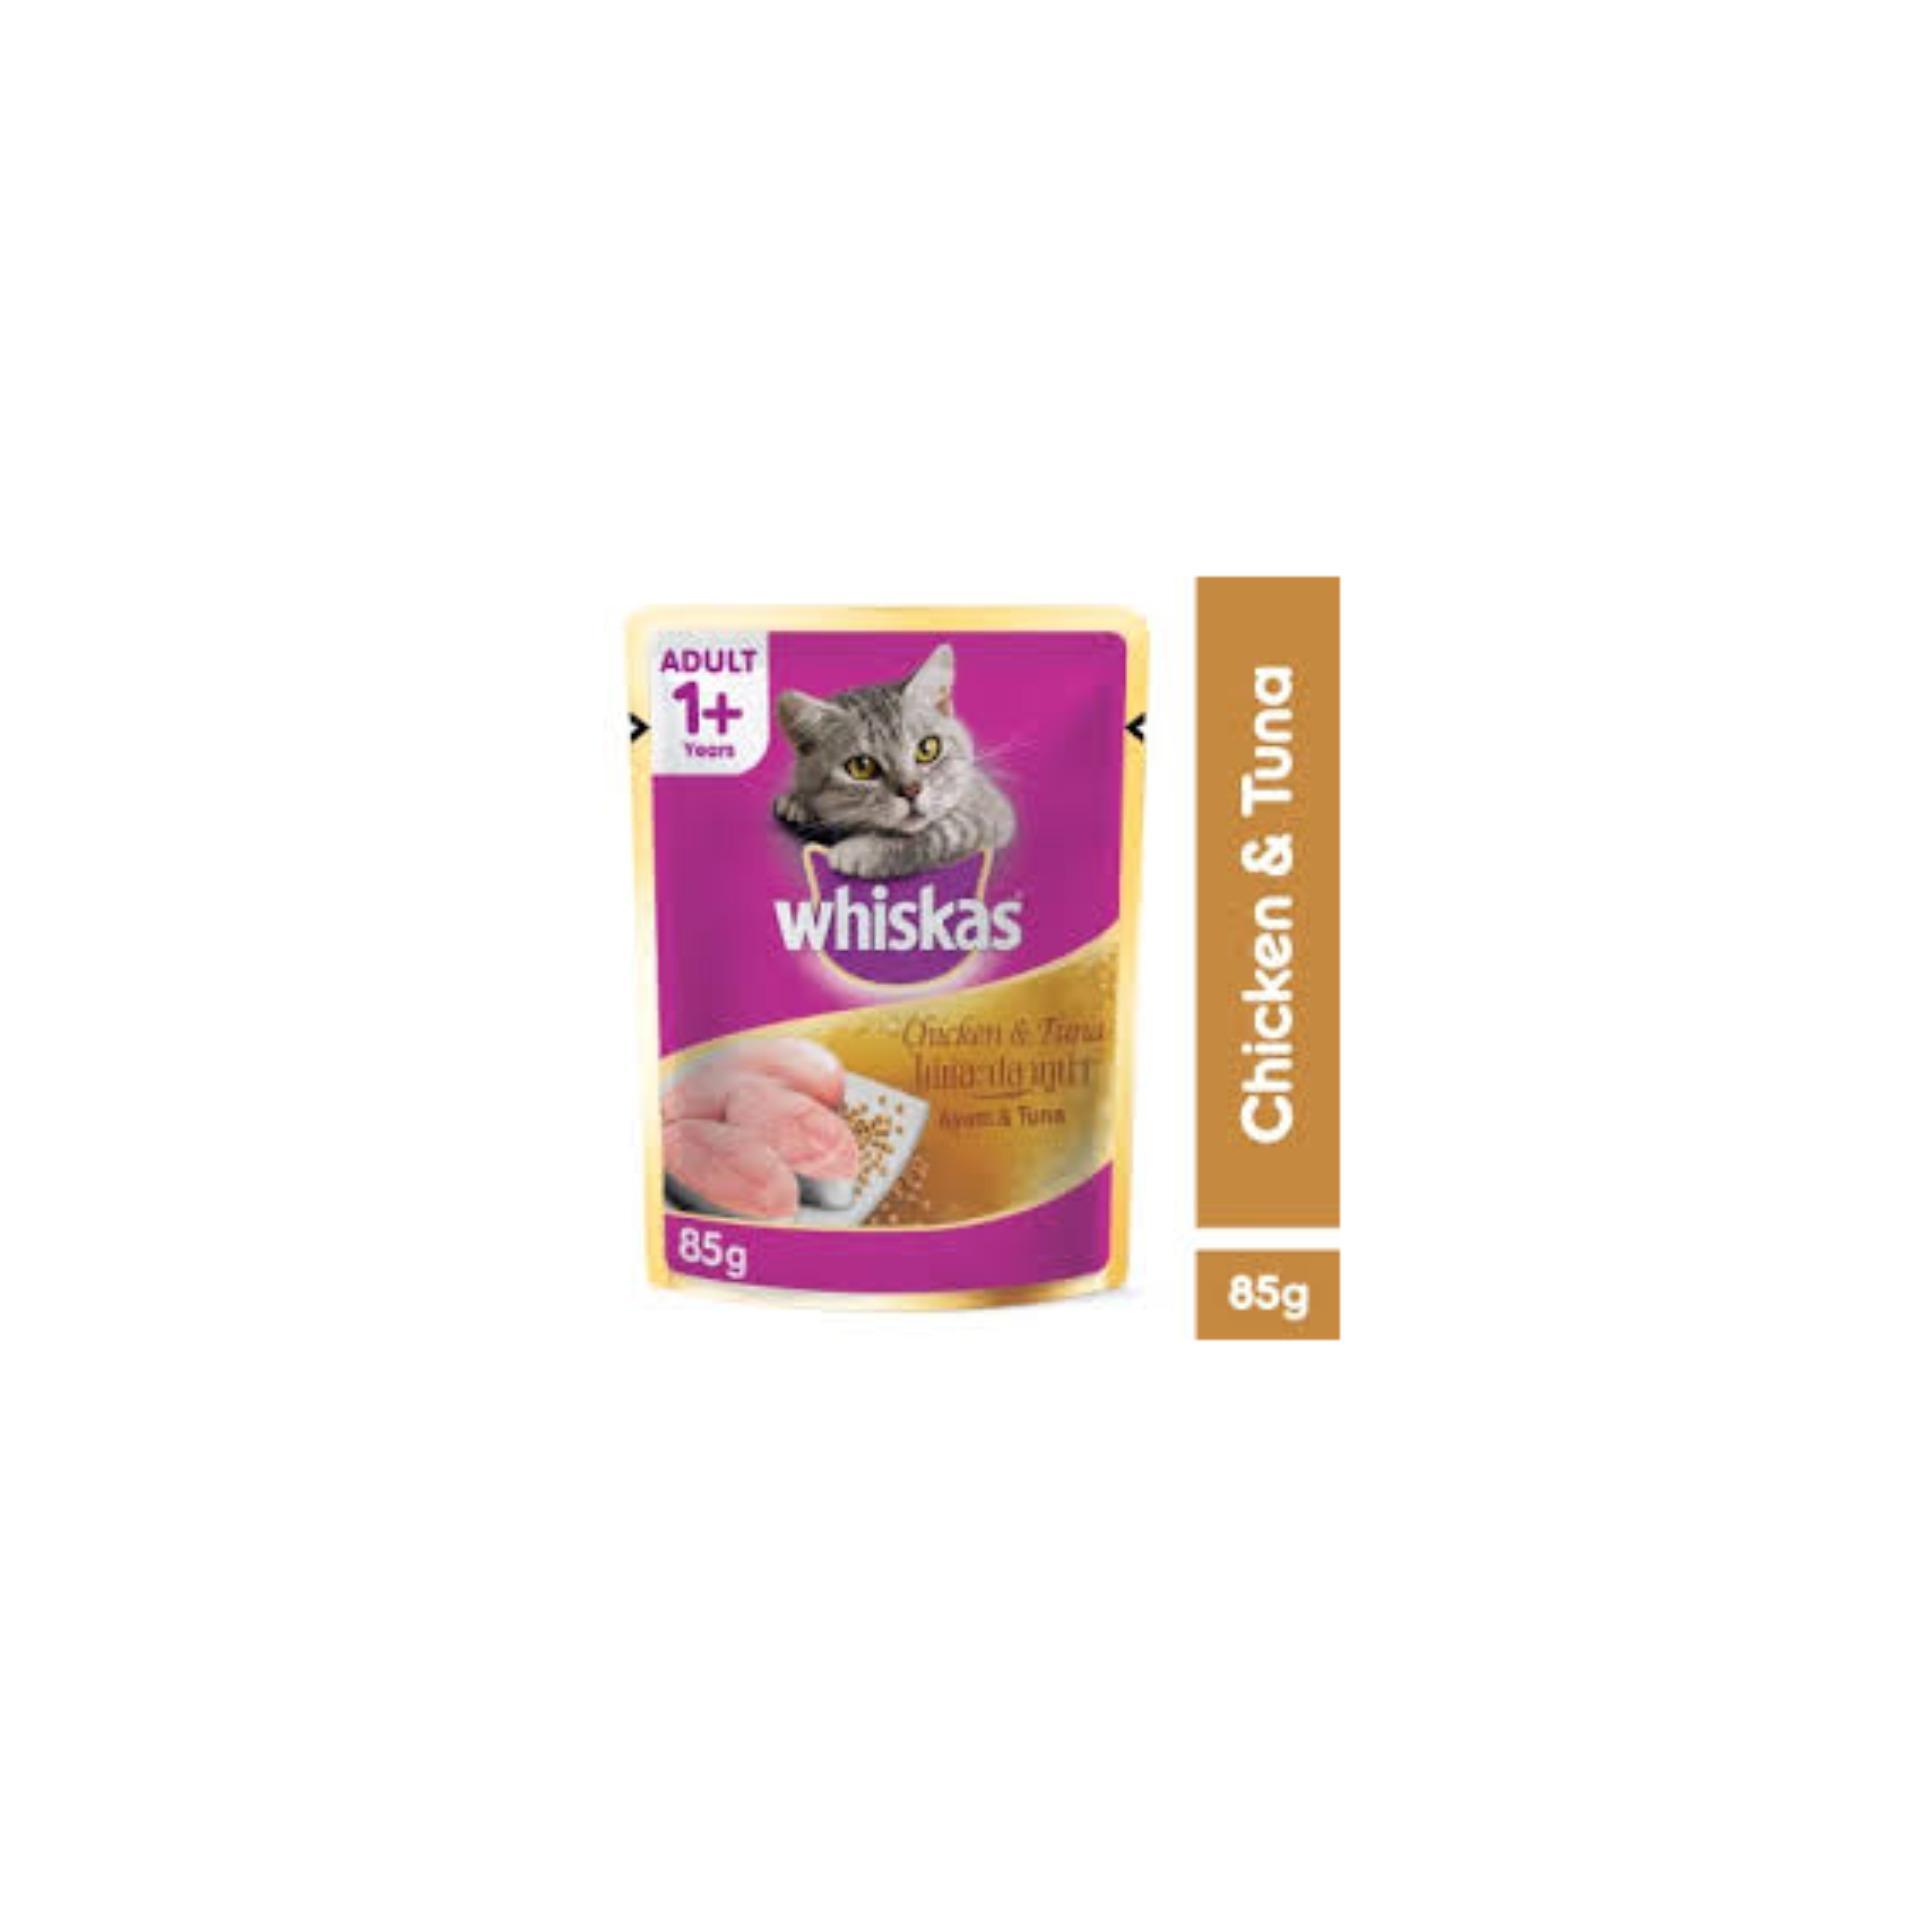 Harga Spesifikasi Sinkgard Food Waste Disposer Alat Penghancur Sisa Premium Series Wet Whiskas Makanan Kucing Wiskas